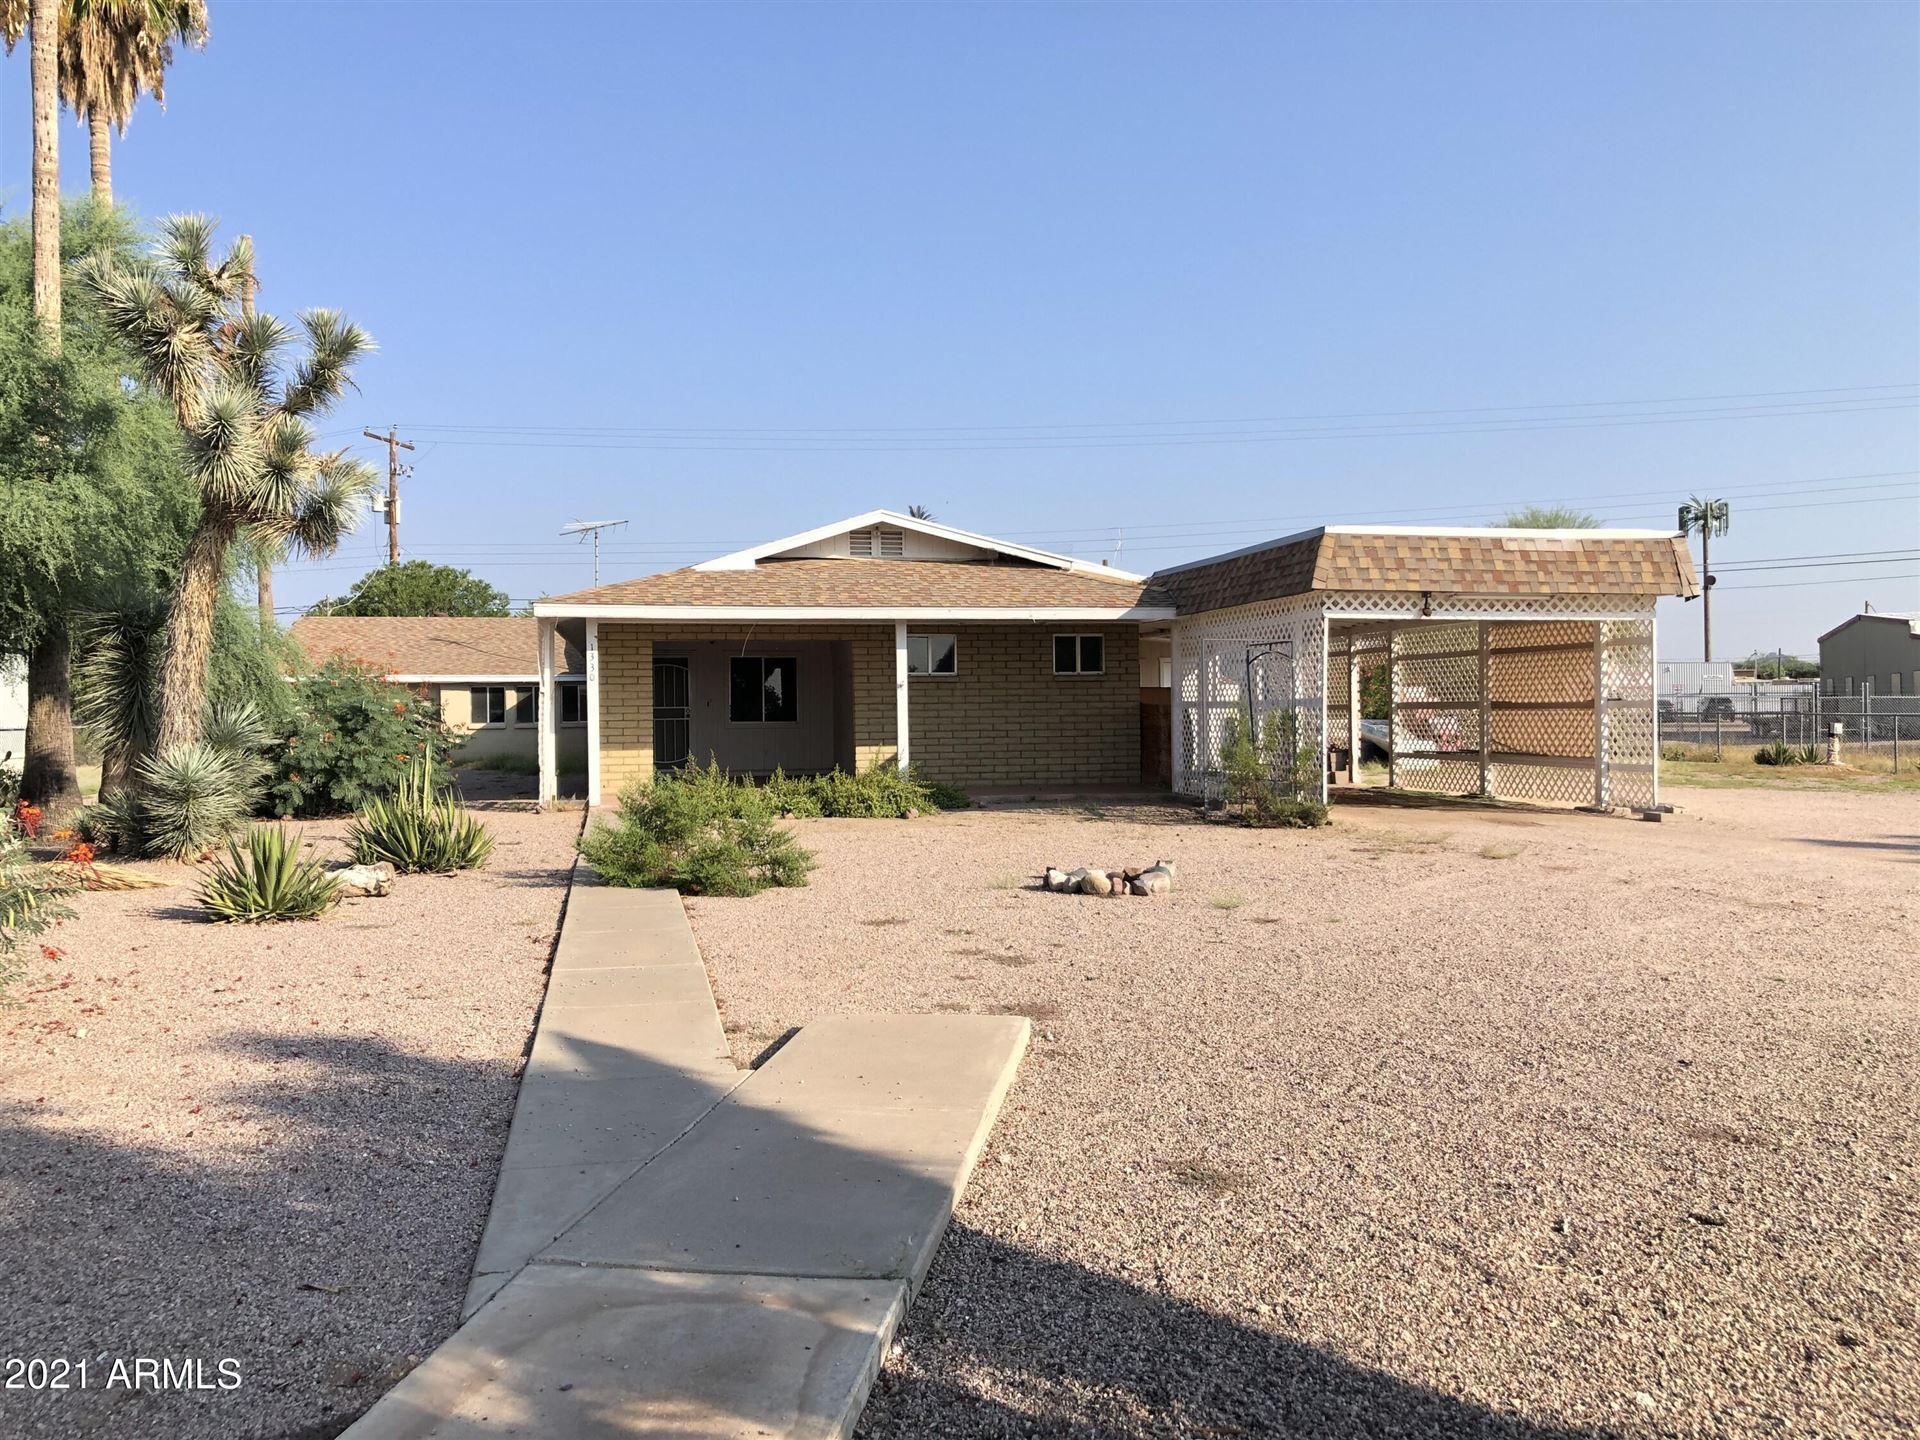 Photo of 1330 E 19TH Avenue, Apache Junction, AZ 85119 (MLS # 6294154)